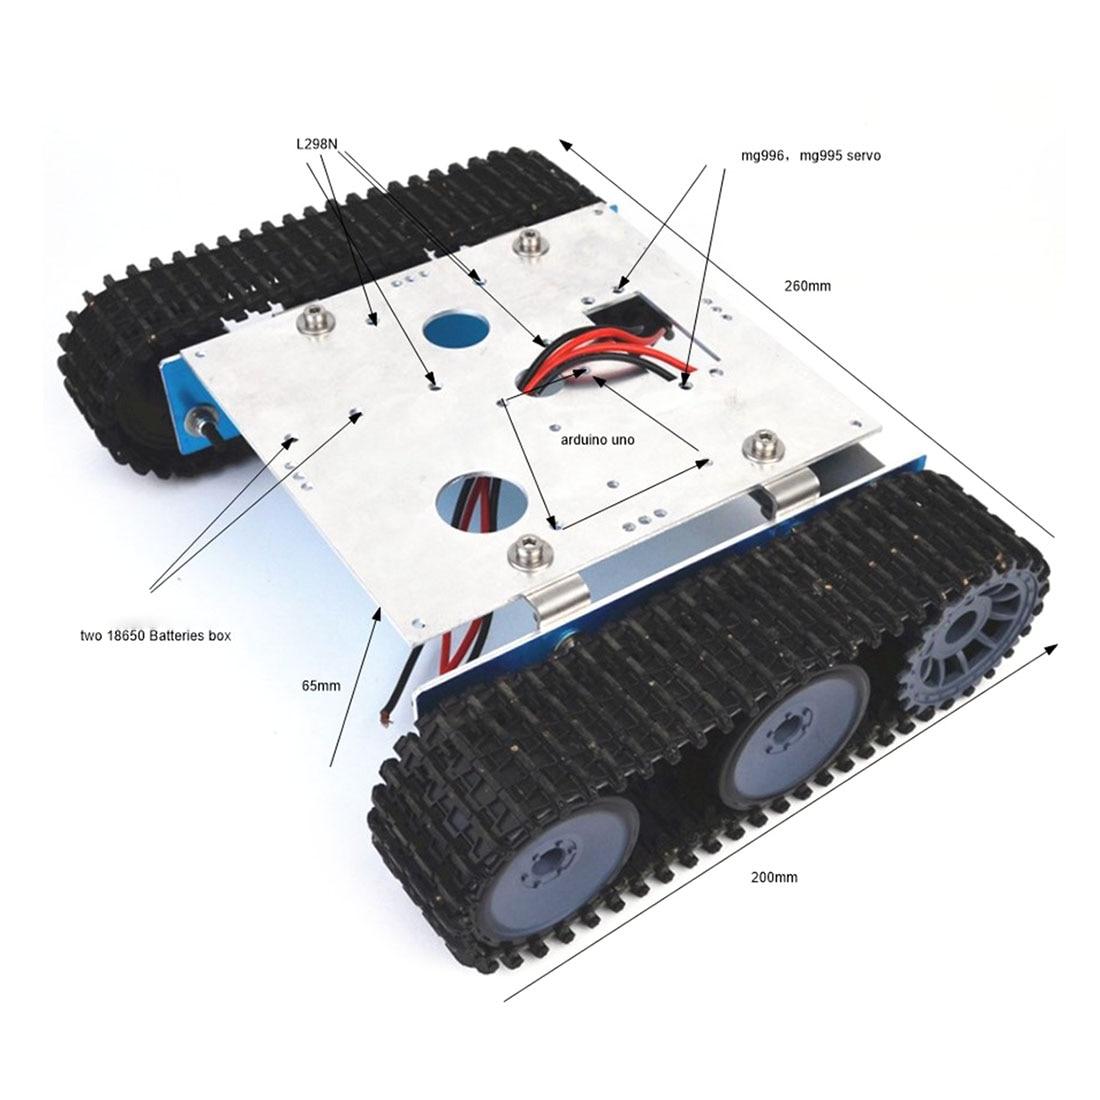 Drop Shipping DIY Aluminium Alloy Tank Robot Caterpillar Vehicle Platform Chassis Assembly Kit For Arduino Kids Birthdaty Gifts